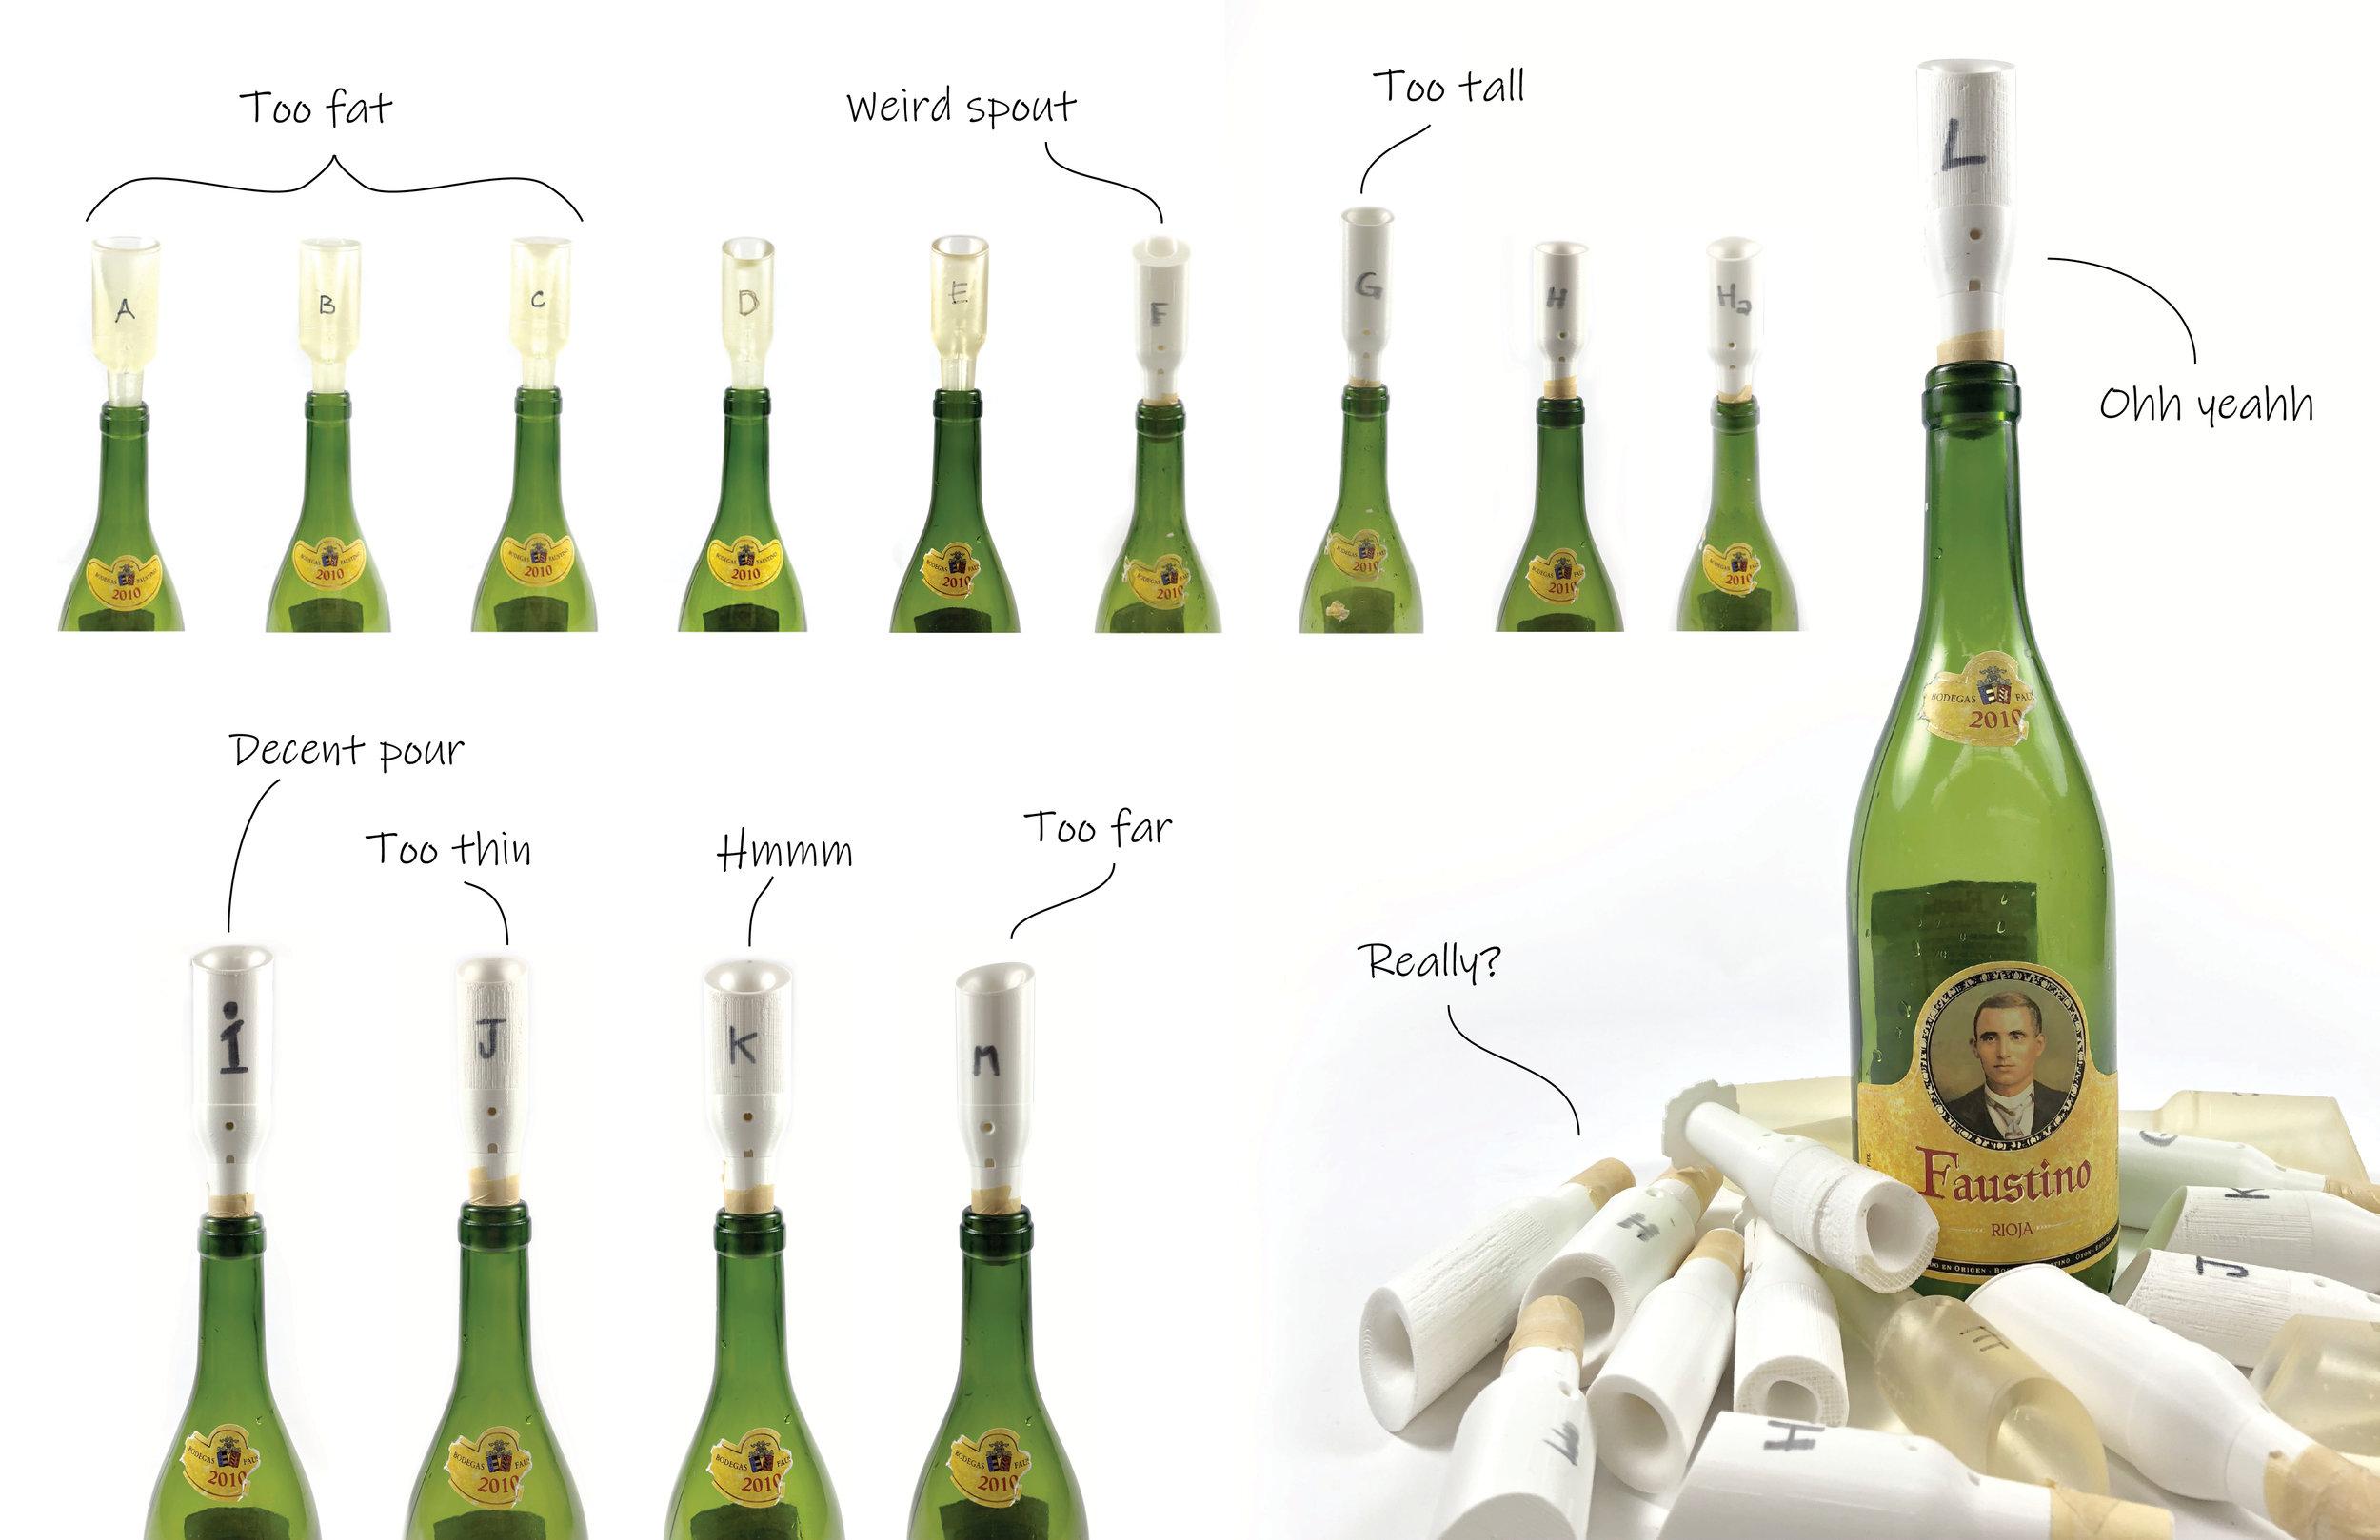 Bottle_Lineup-002.jpg